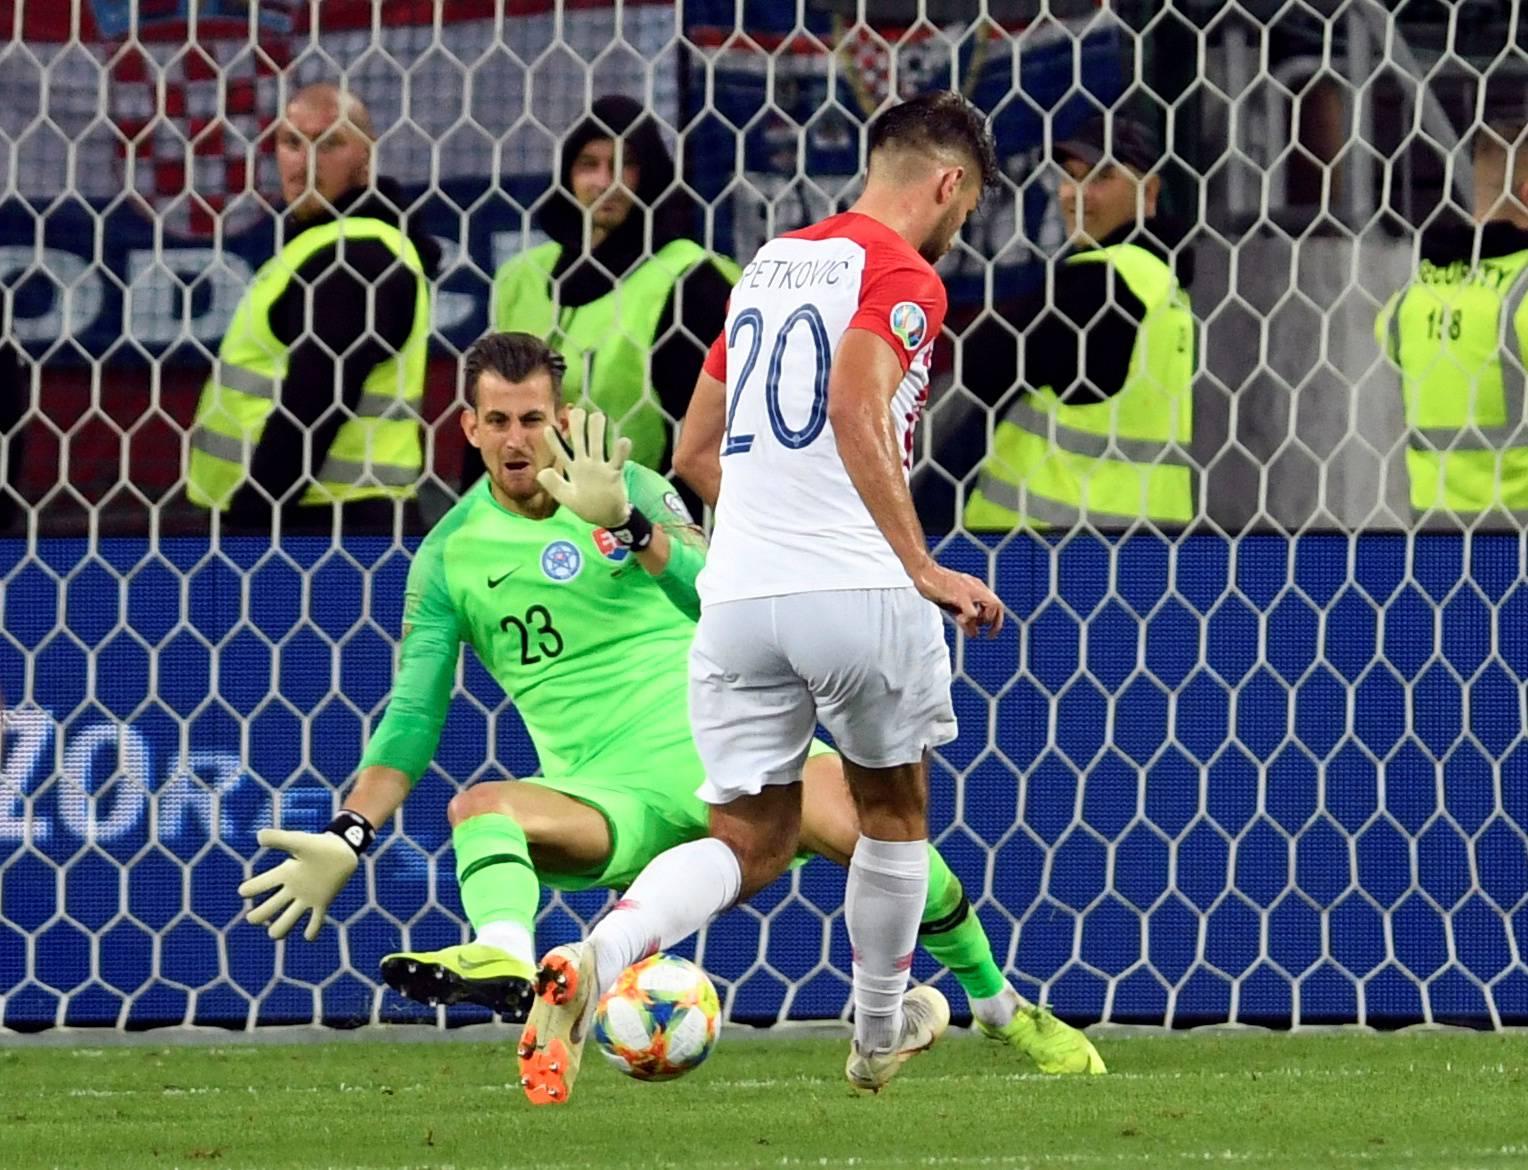 Euro 2020 Qualifier - Group E - Slovakia v Croatia